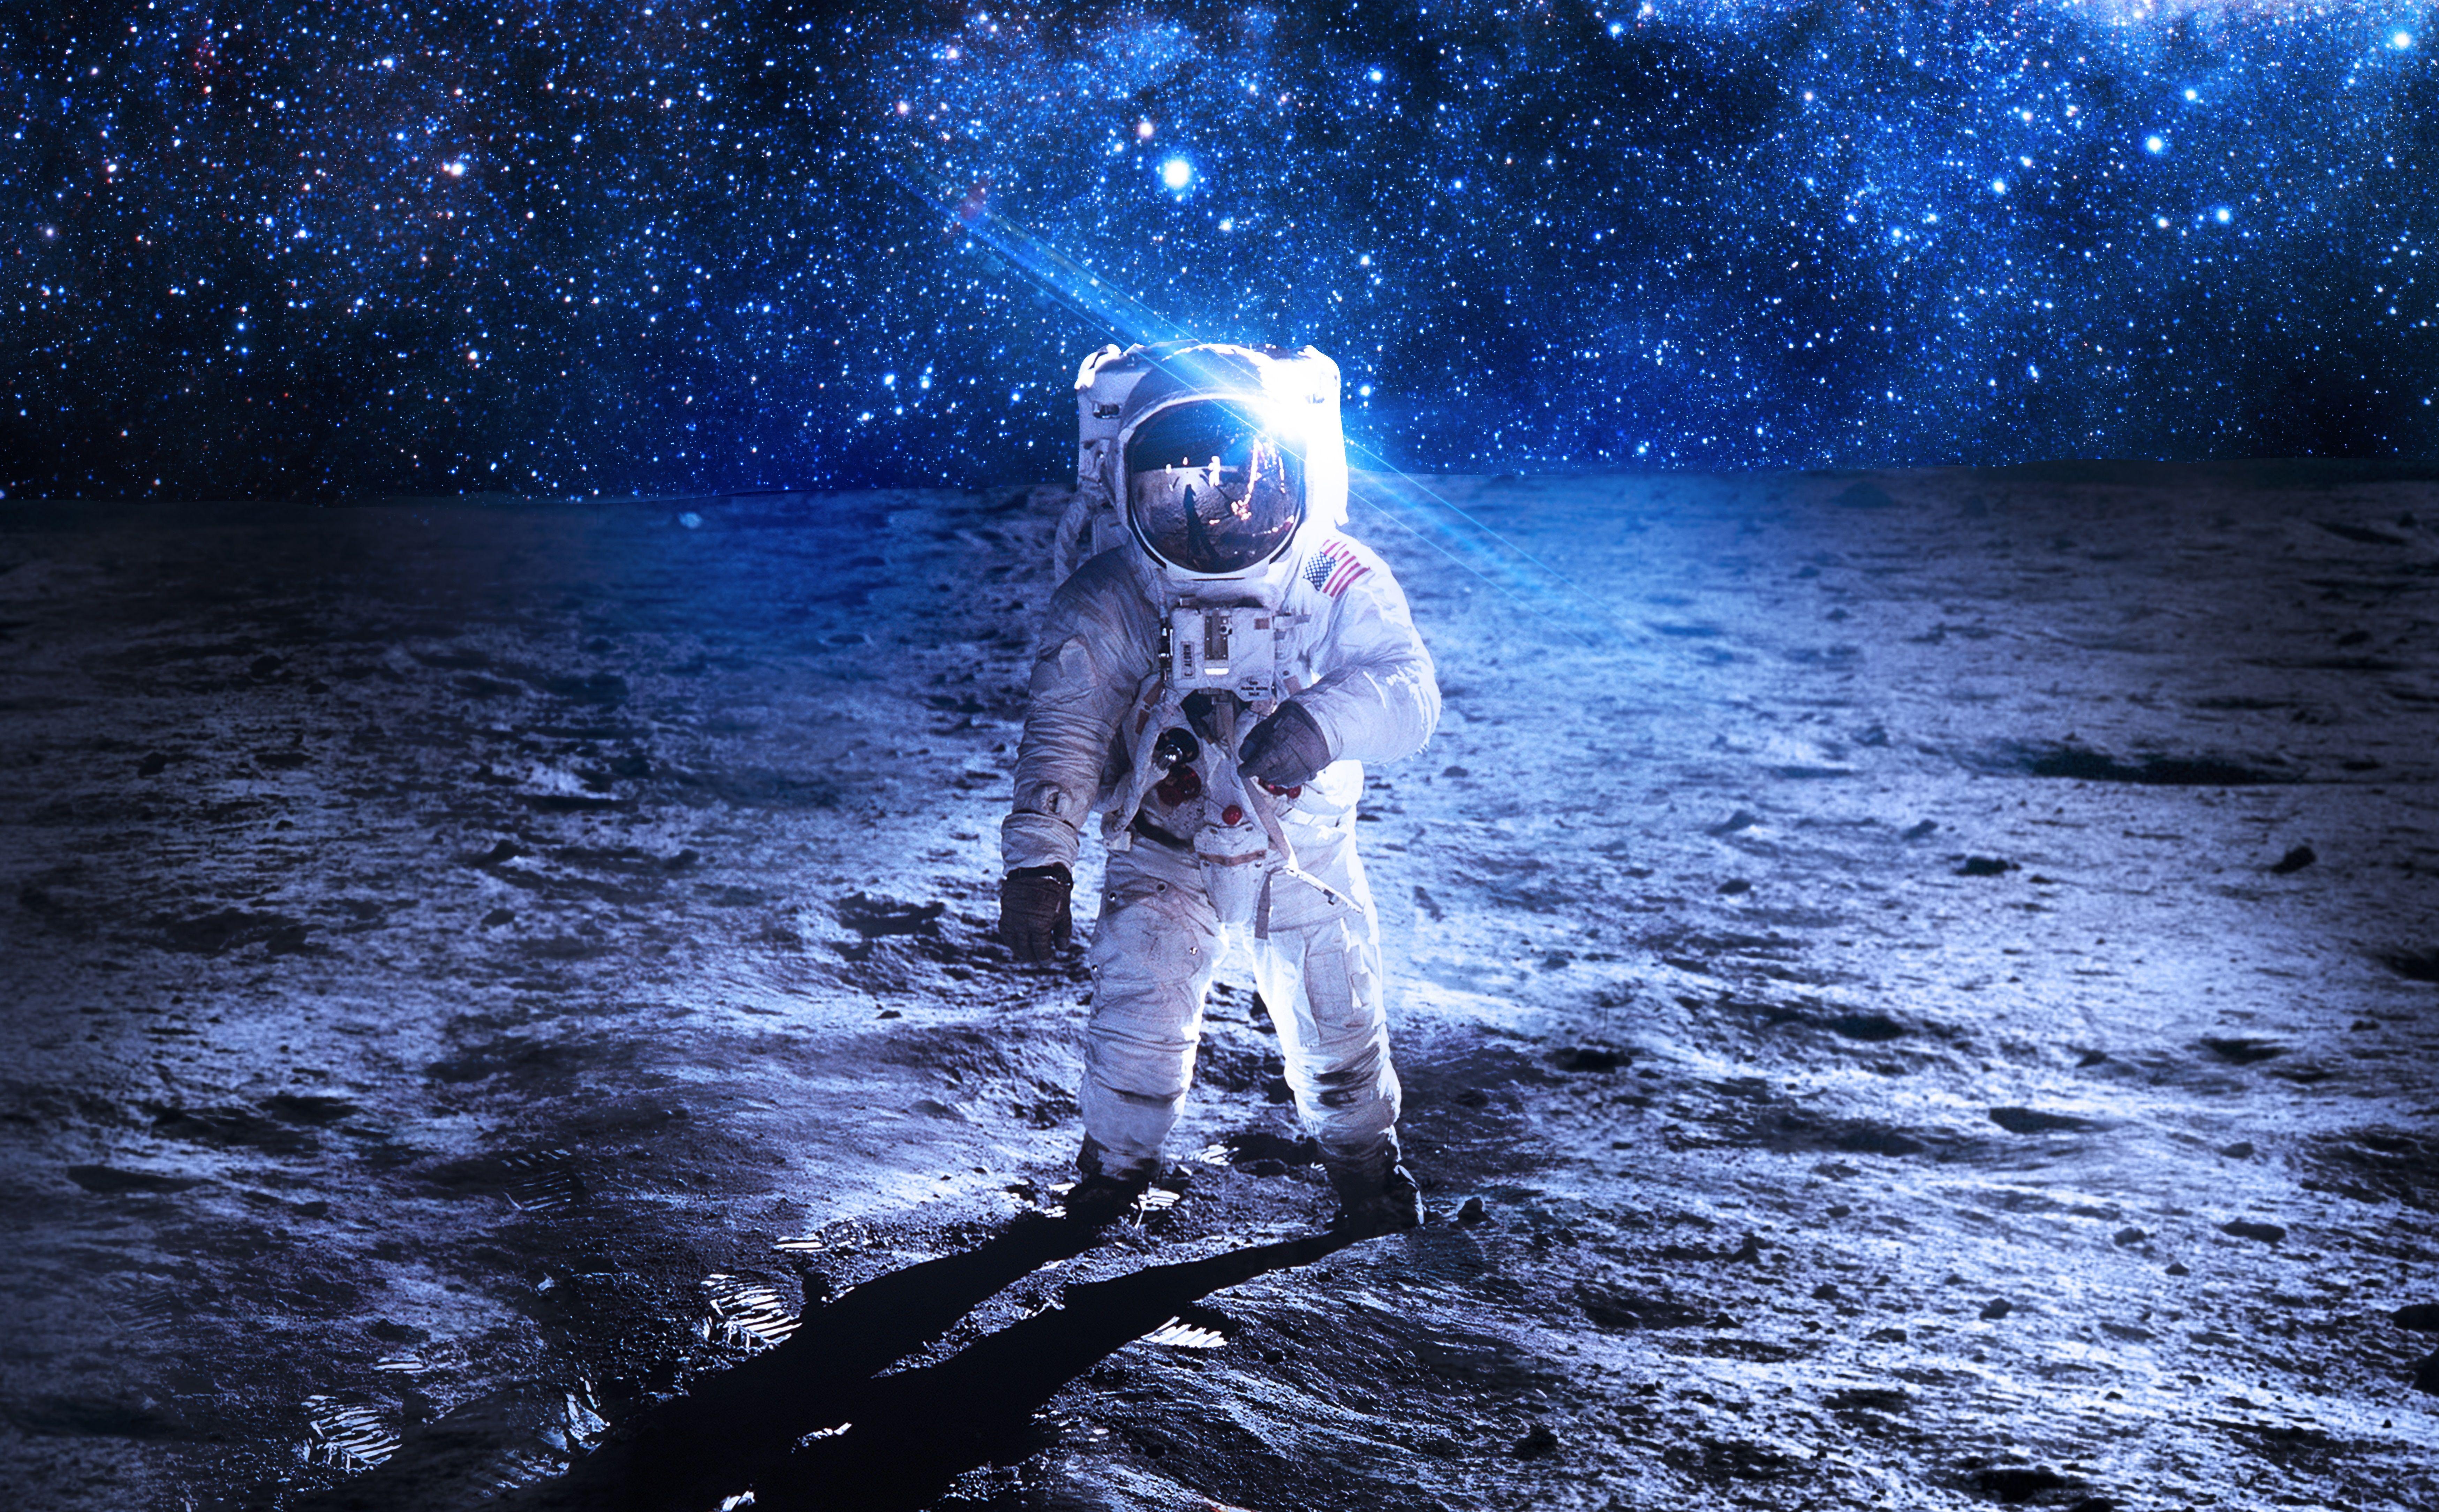 Sci Fi Astronaut Wallpaper